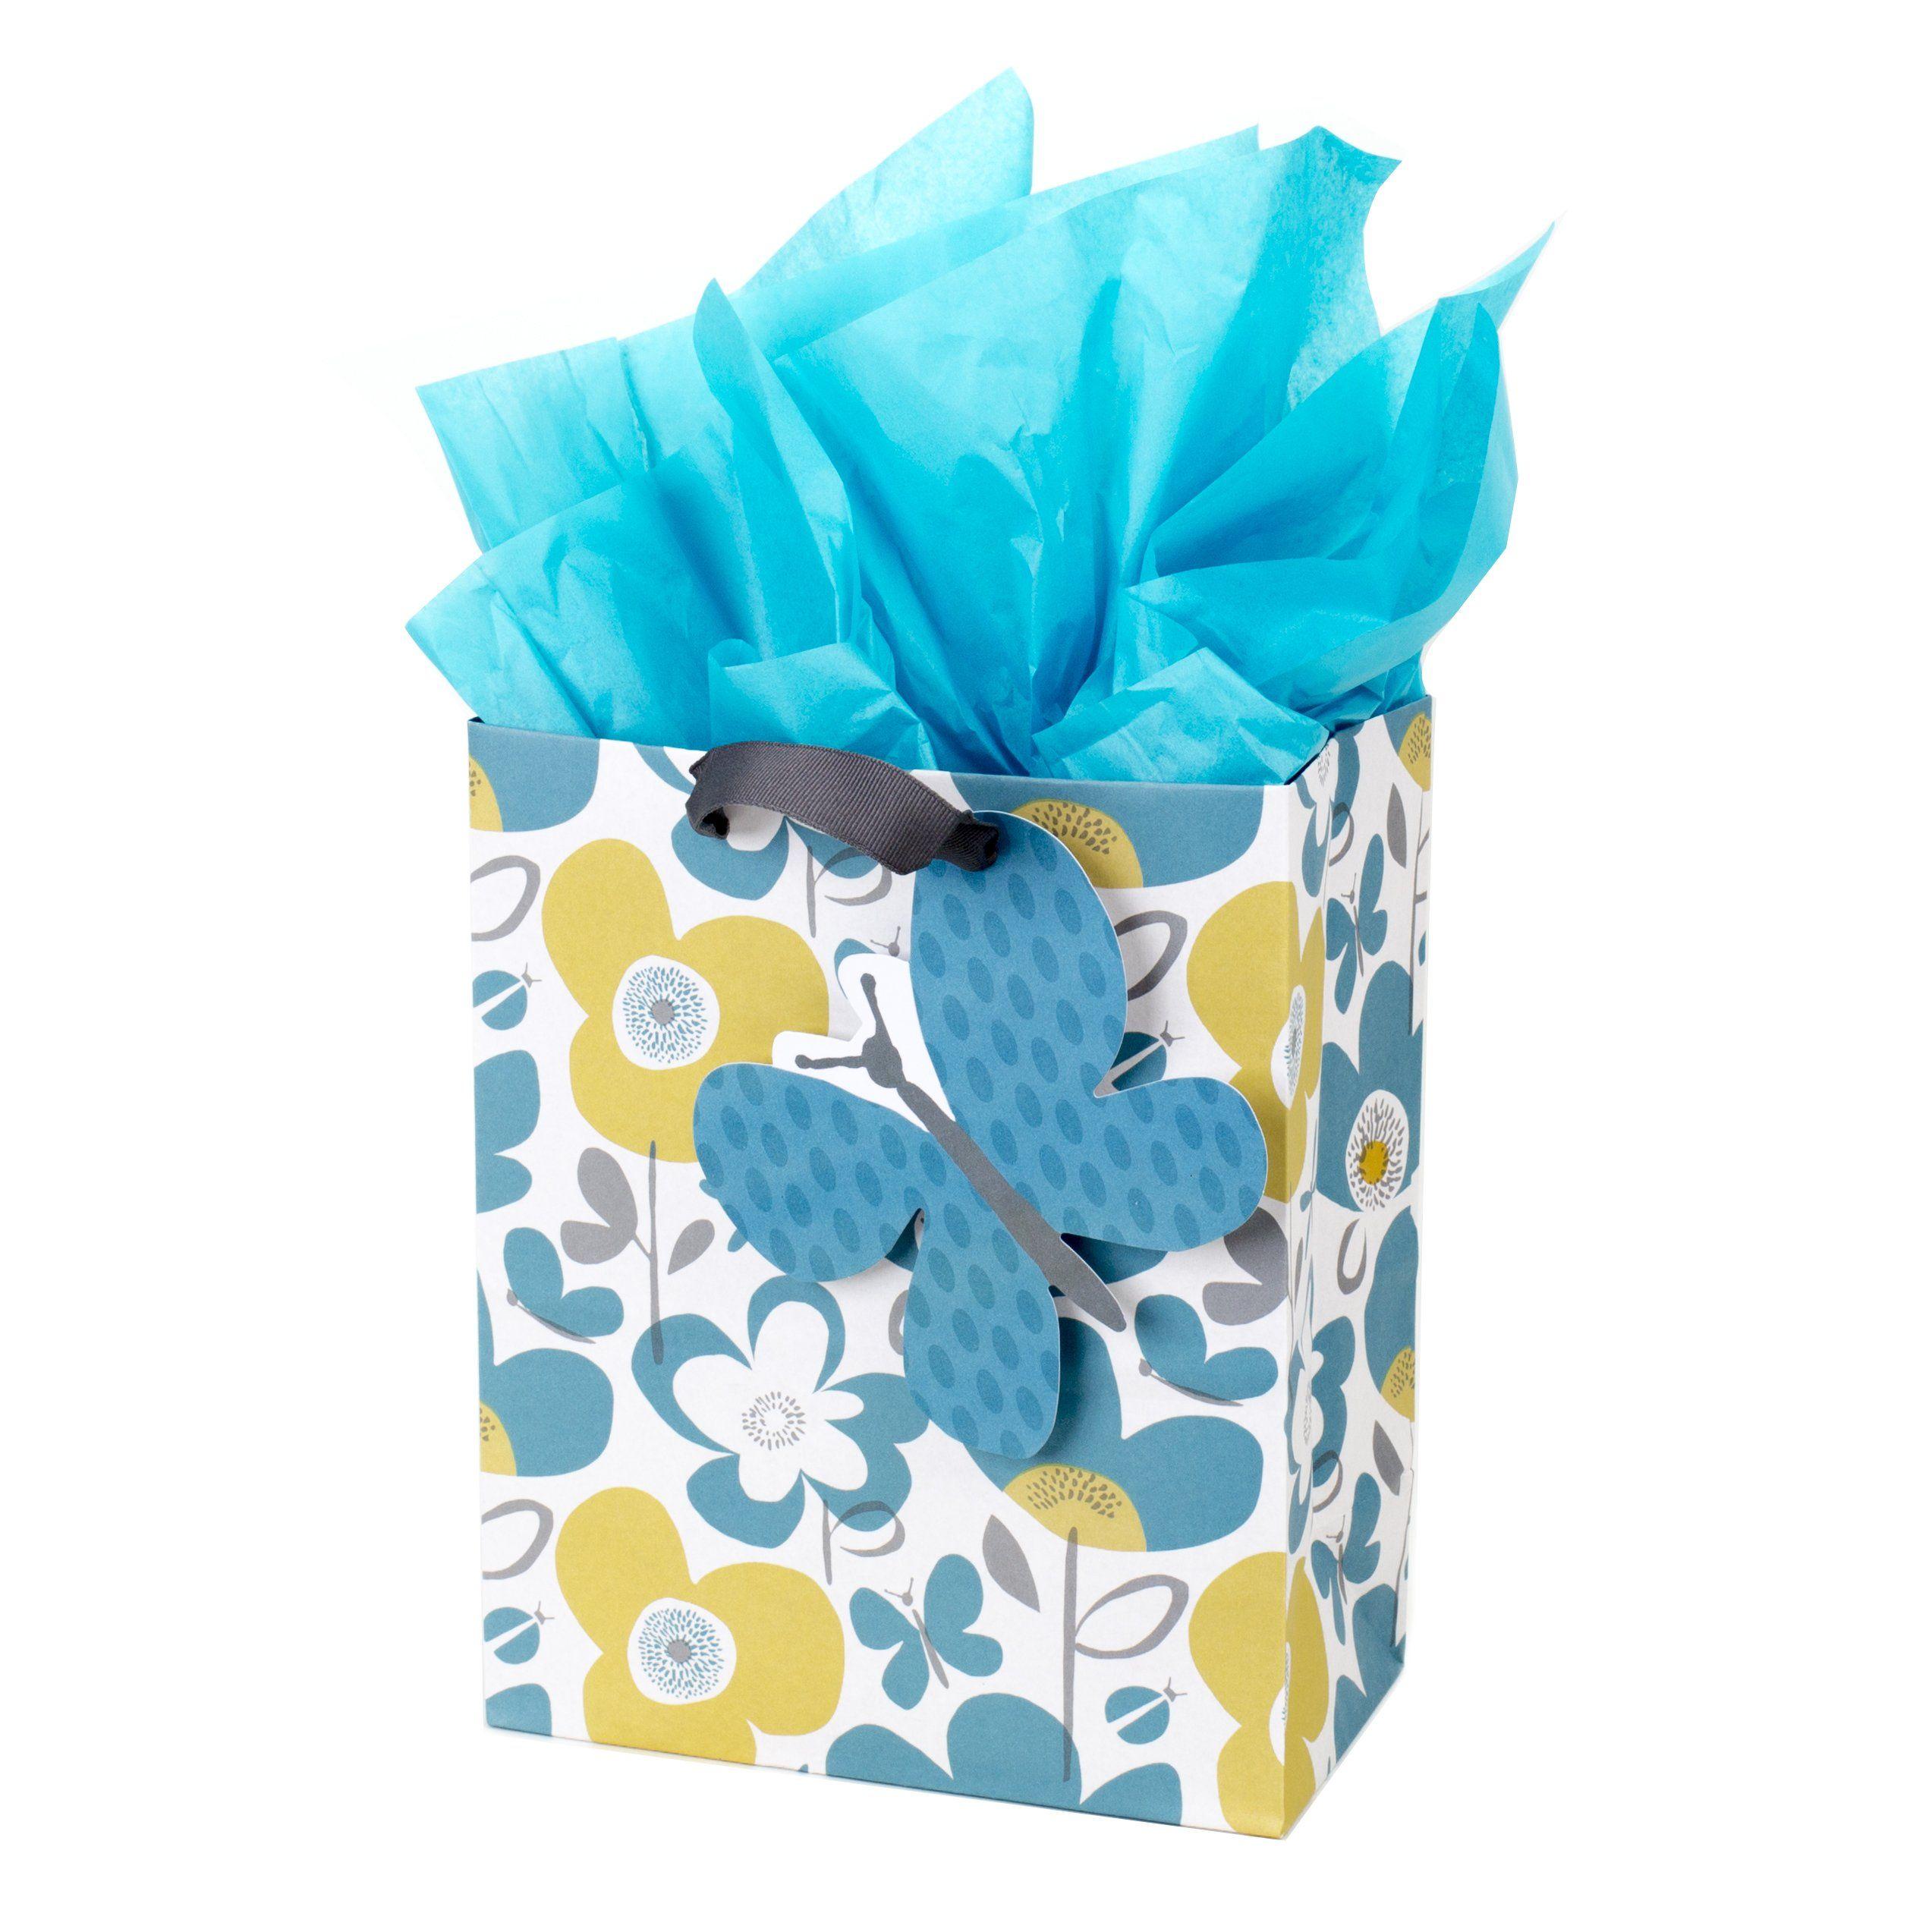 Hallmark medium gift bag with tissue paper butterfly